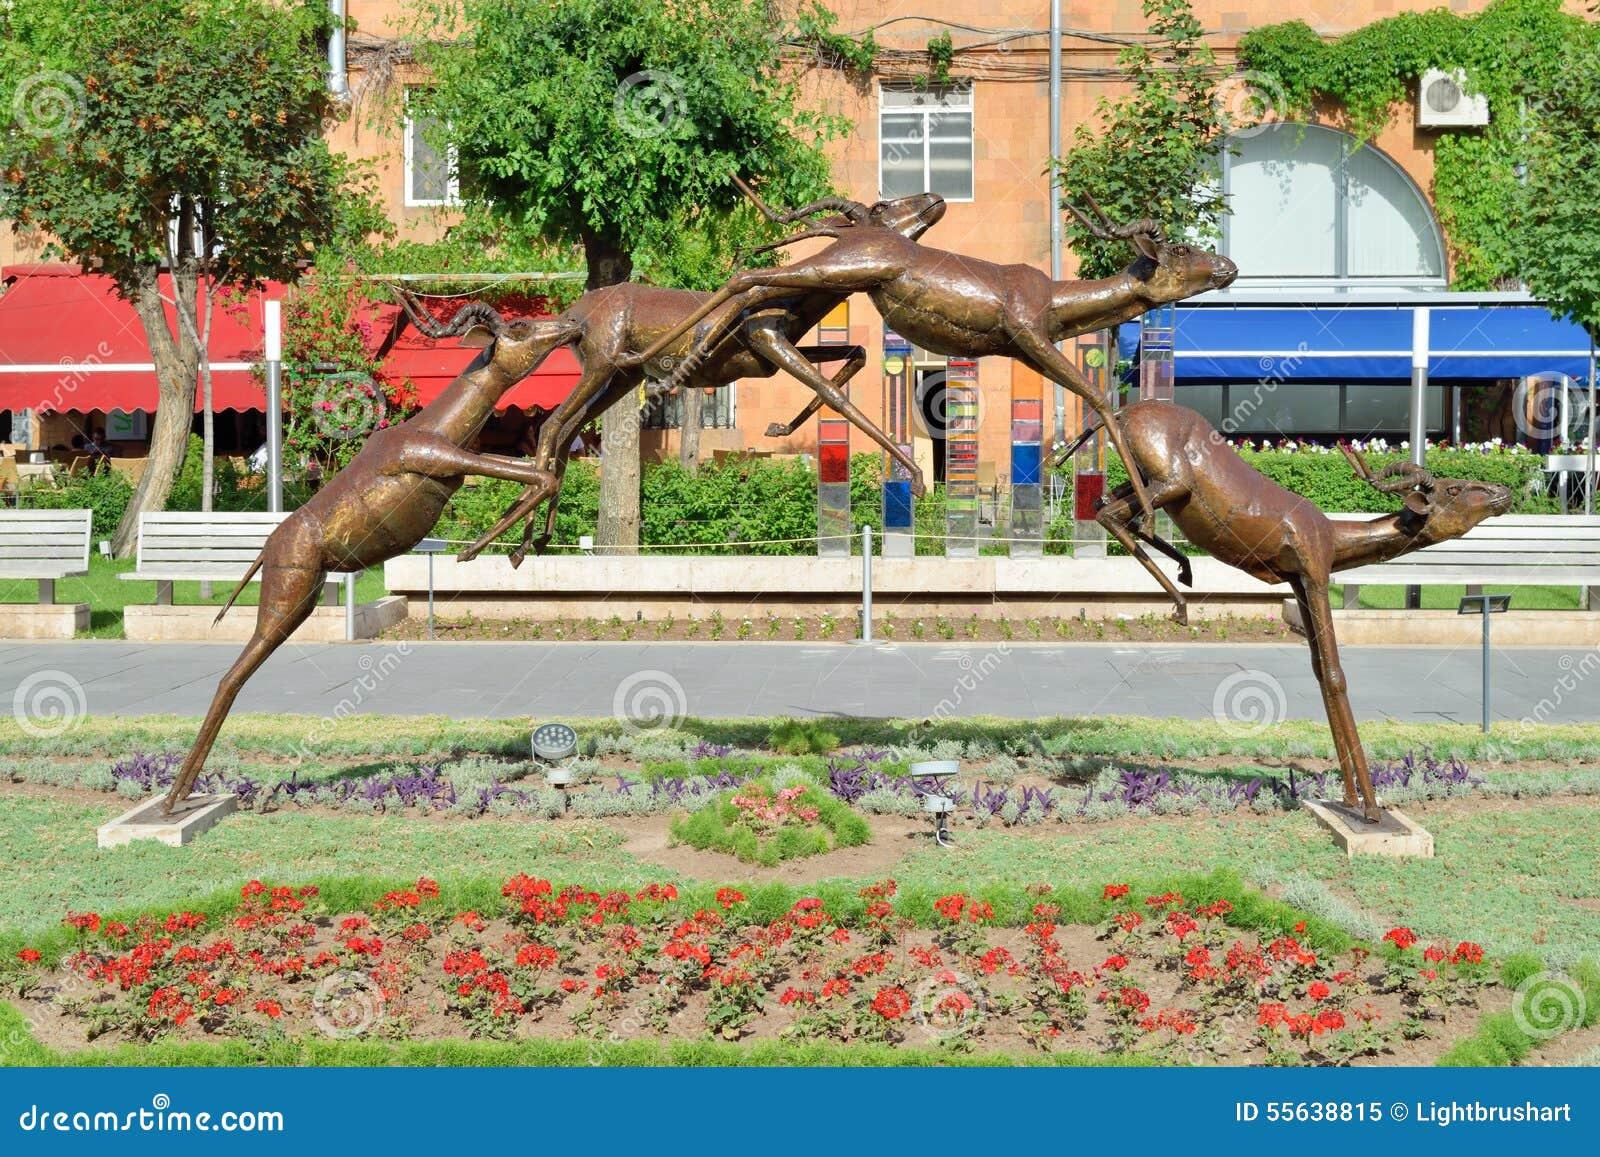 Jumping antelopes sculpture, Yerevan, Armenia